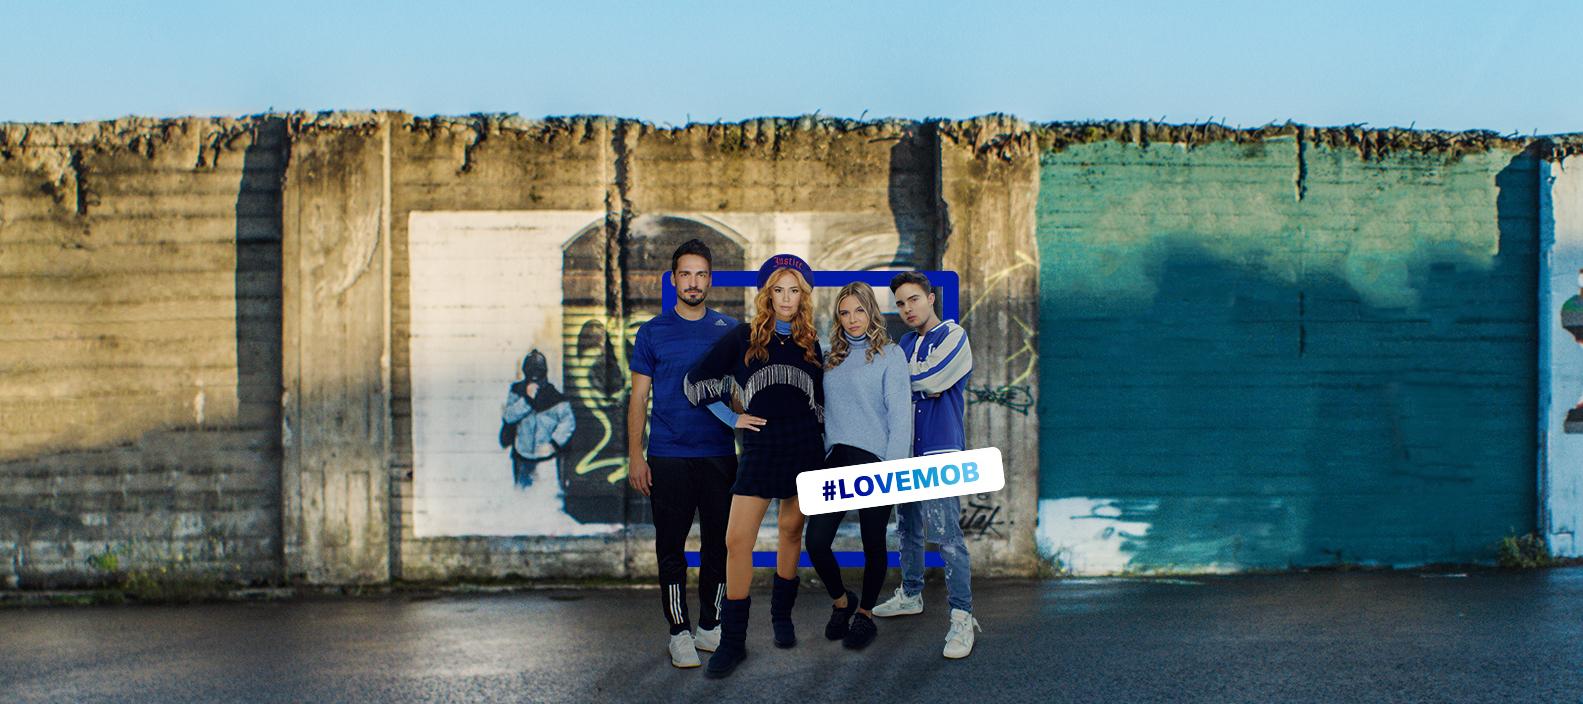 #LOVEMOB: So engagieren sich Mats, Palina, Dagi und Mike